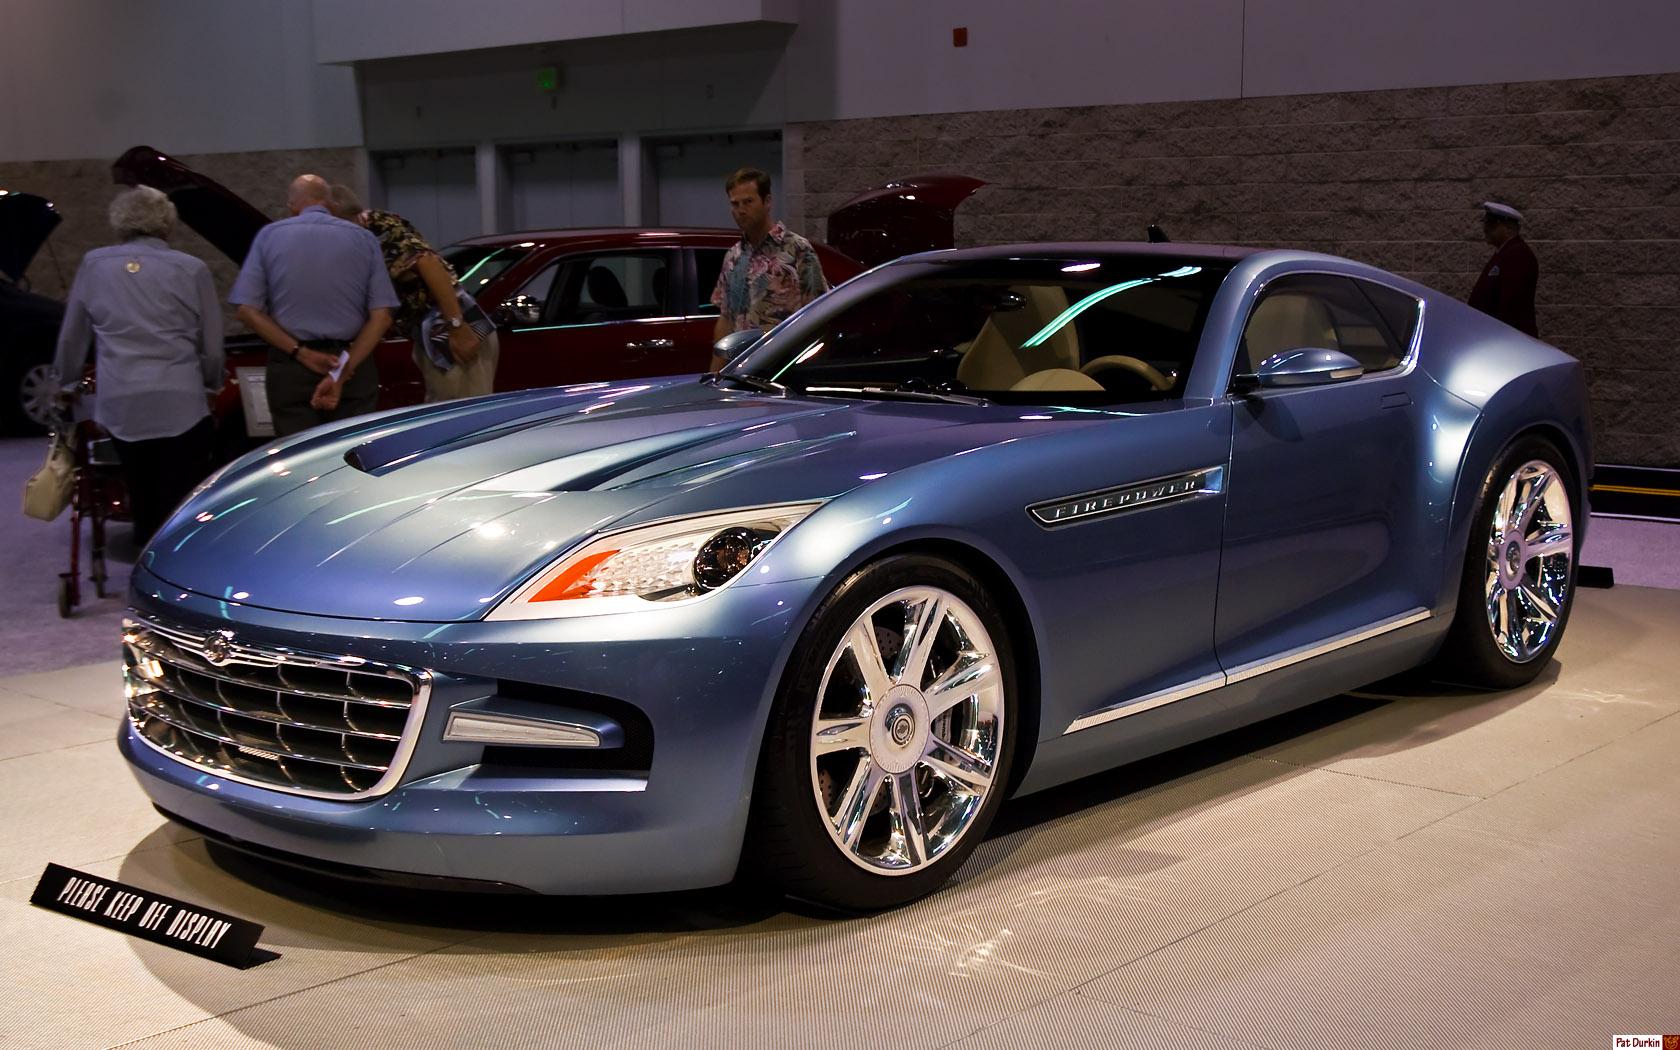 Chrysler_Firepower_Concept_-_fvl.jpg